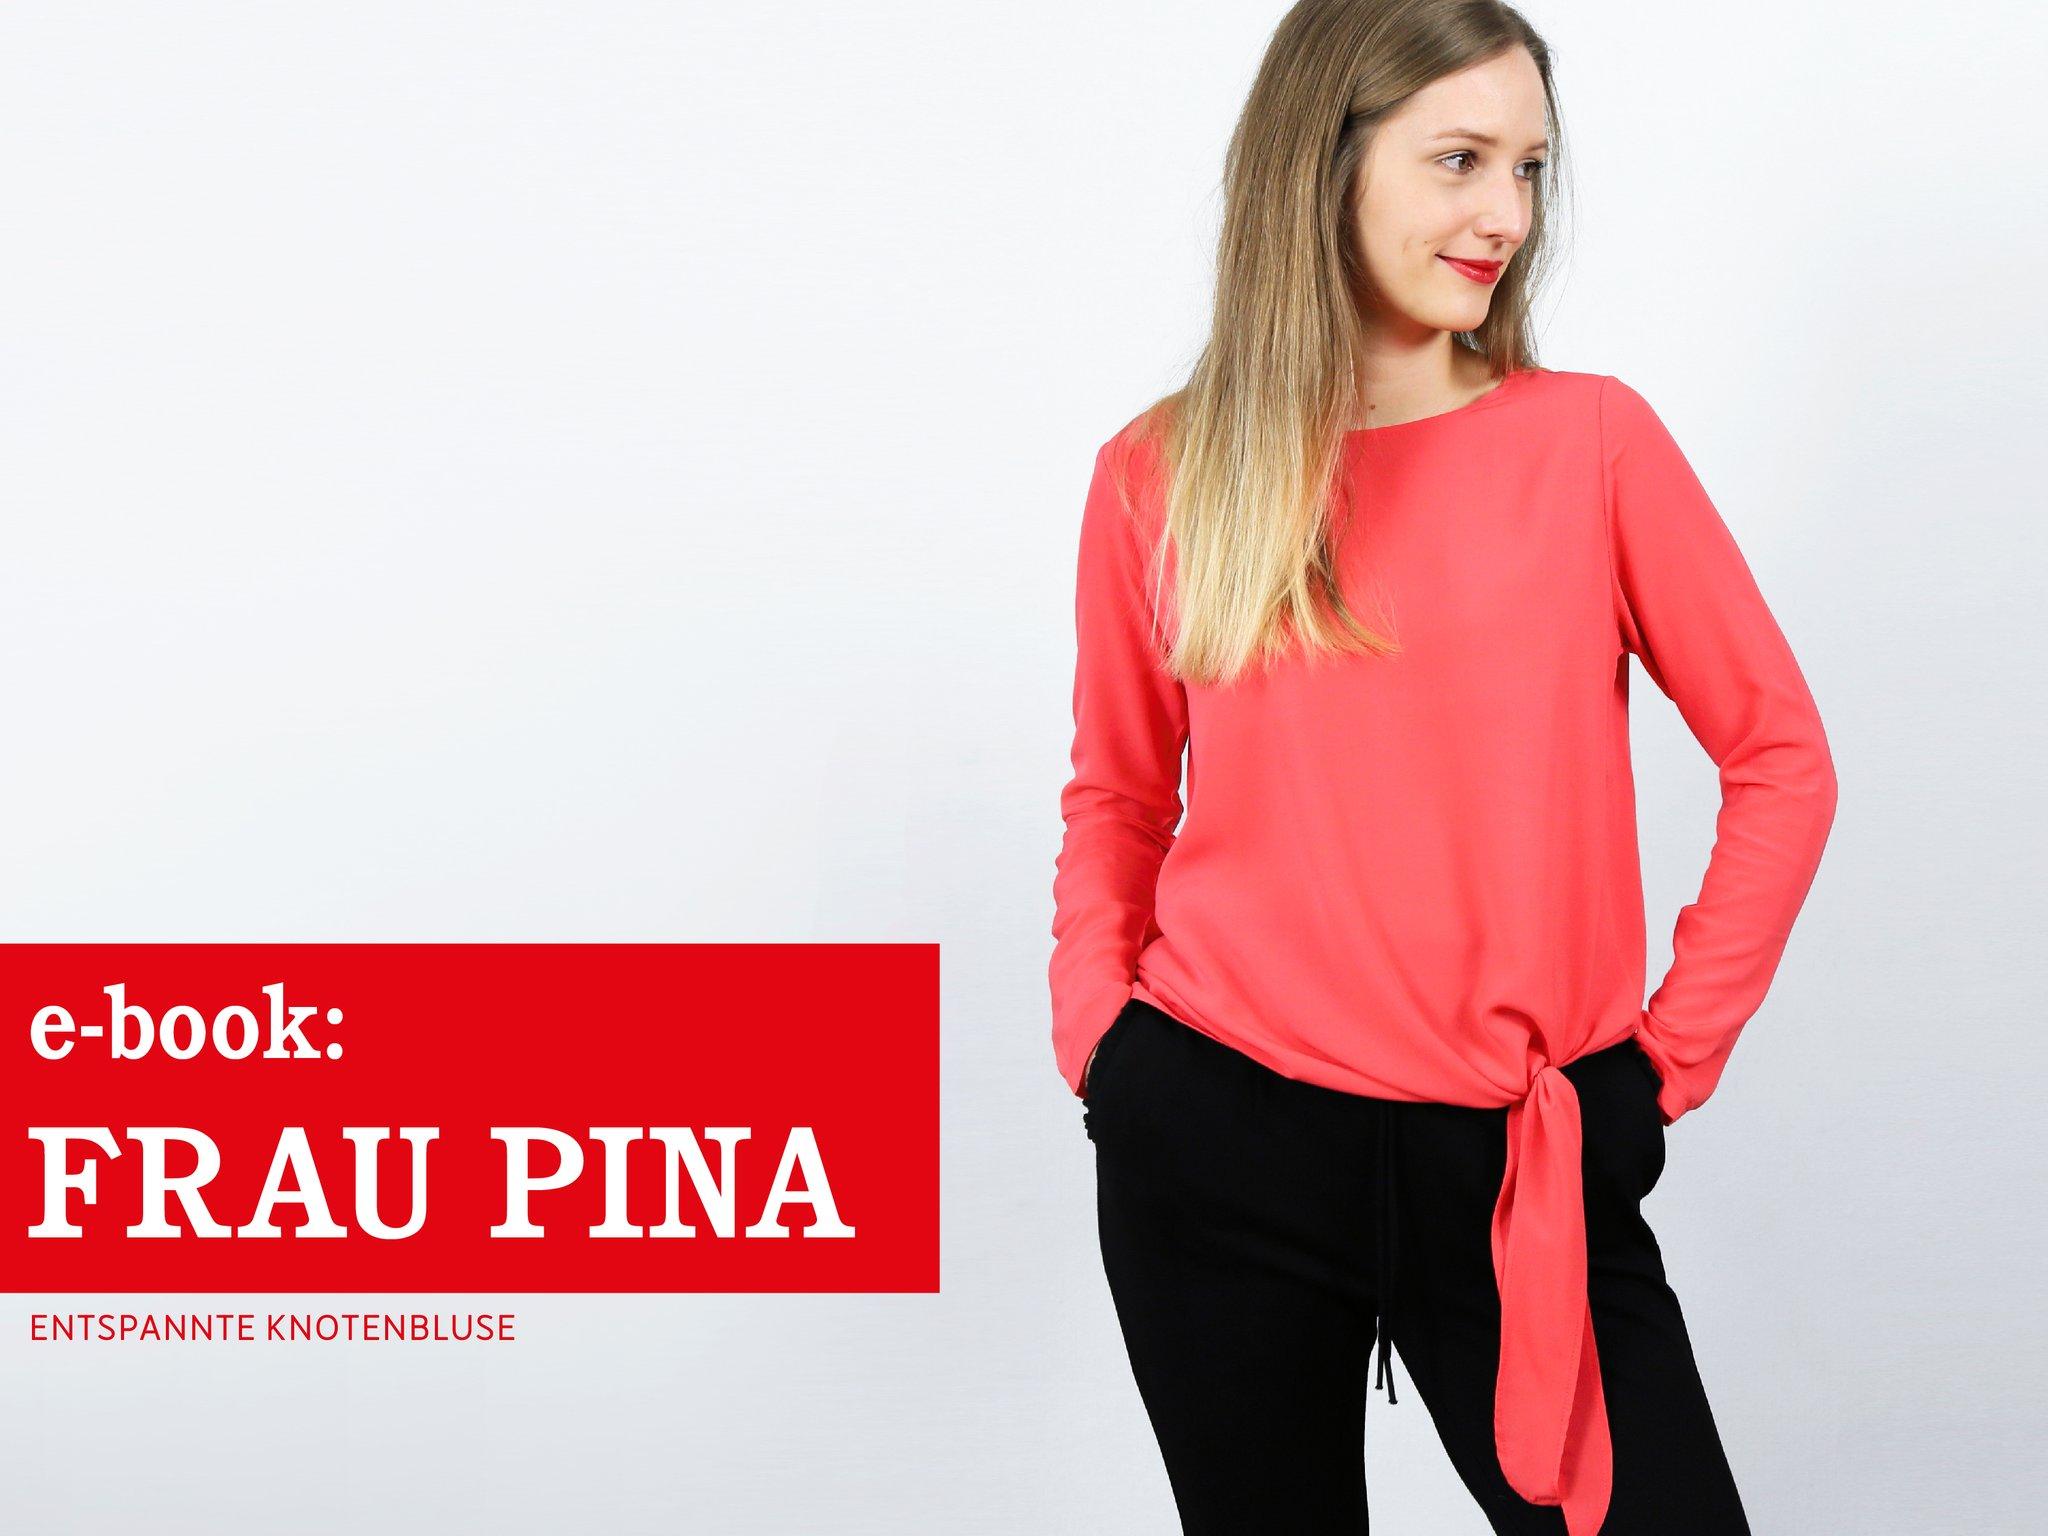 FRAU PINA • entspannte Knotenbluse, e-book